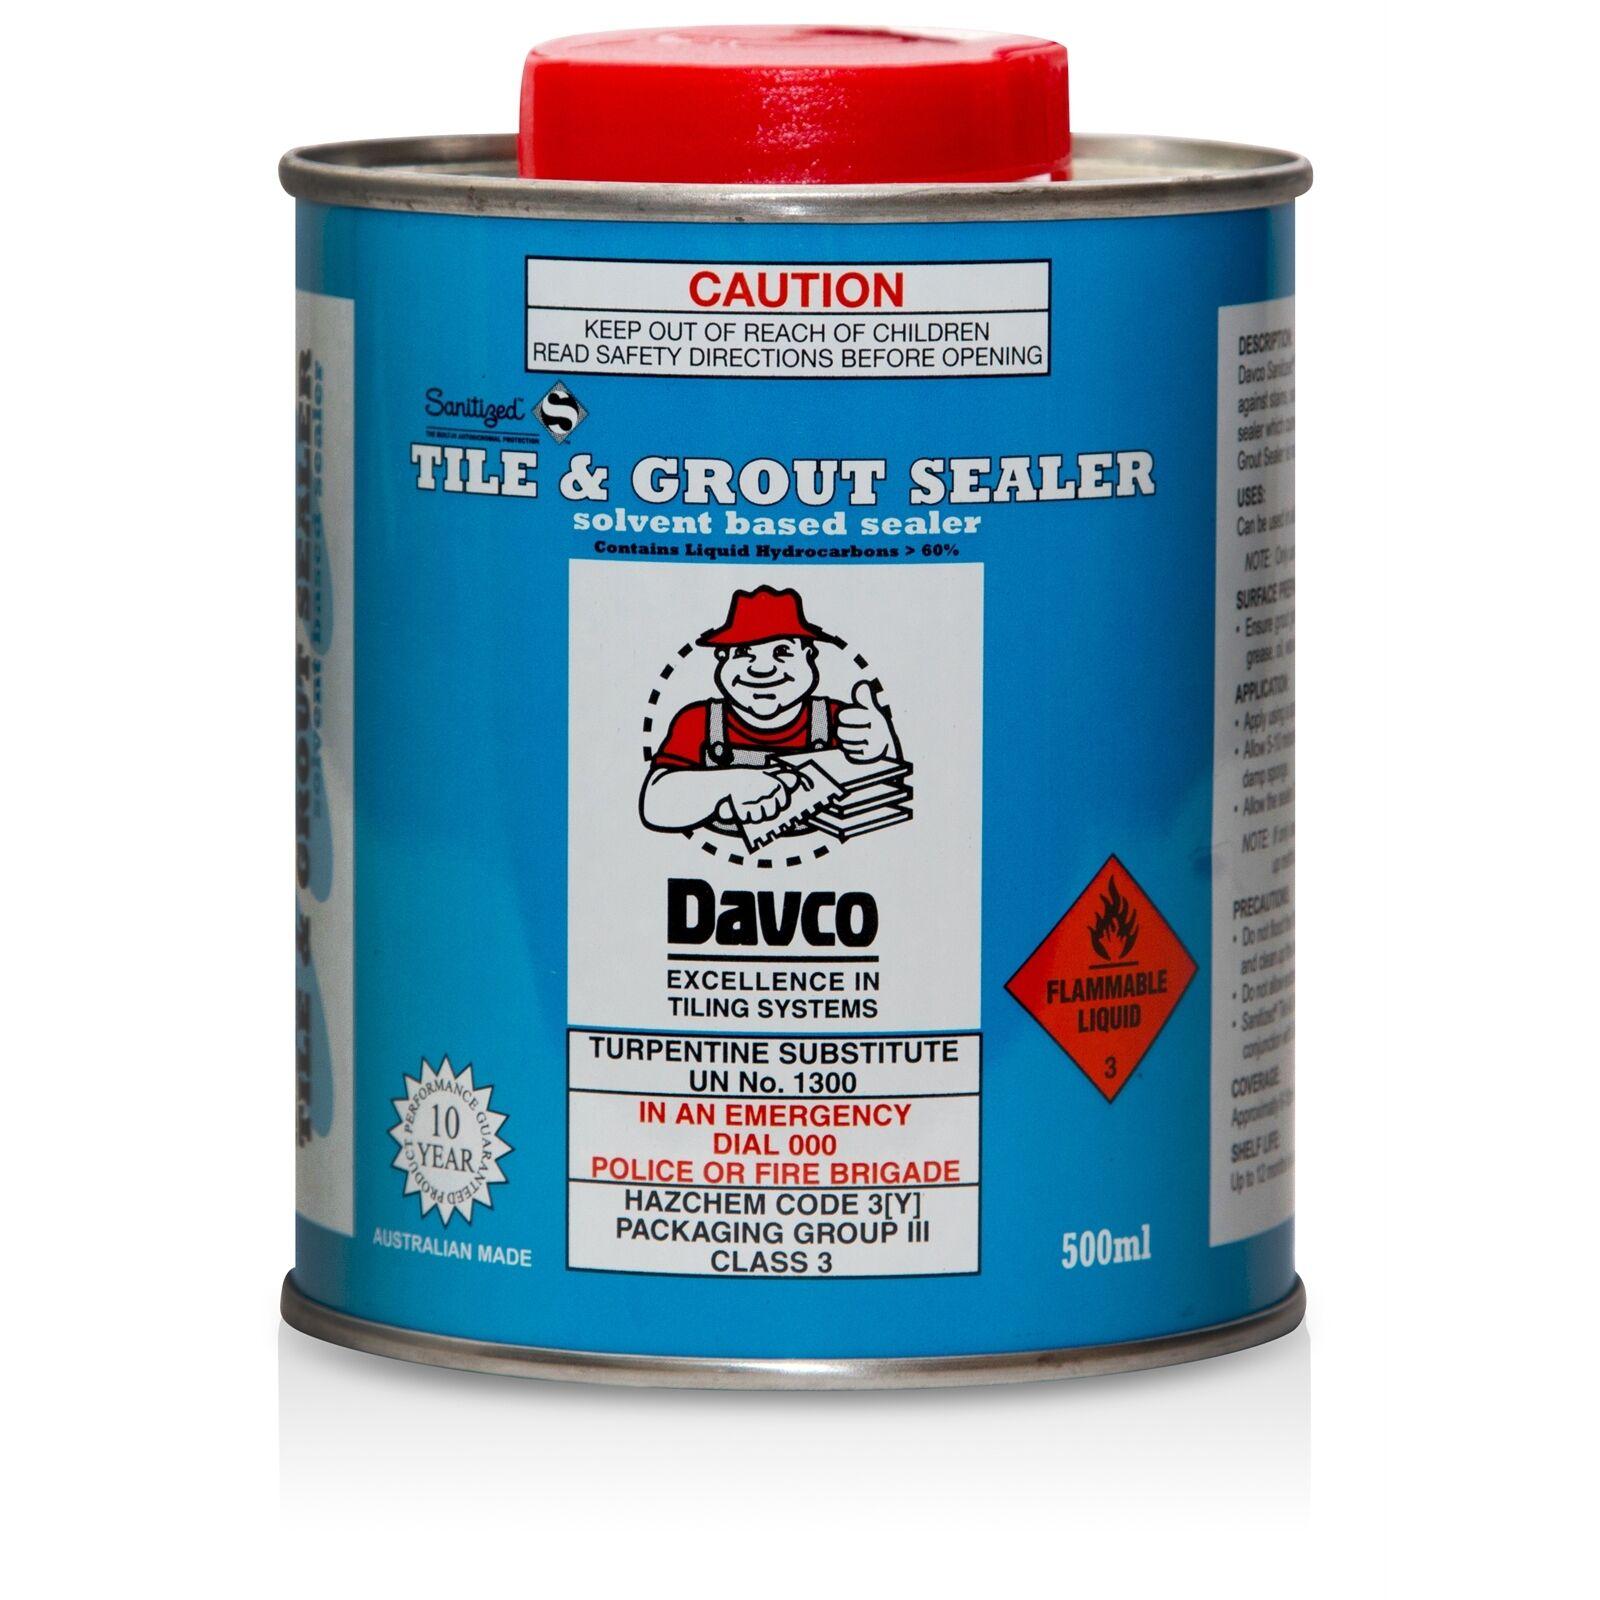 DAVCO Sanitized Tile & Grout Sealer 500ml Solvent Based Water ...